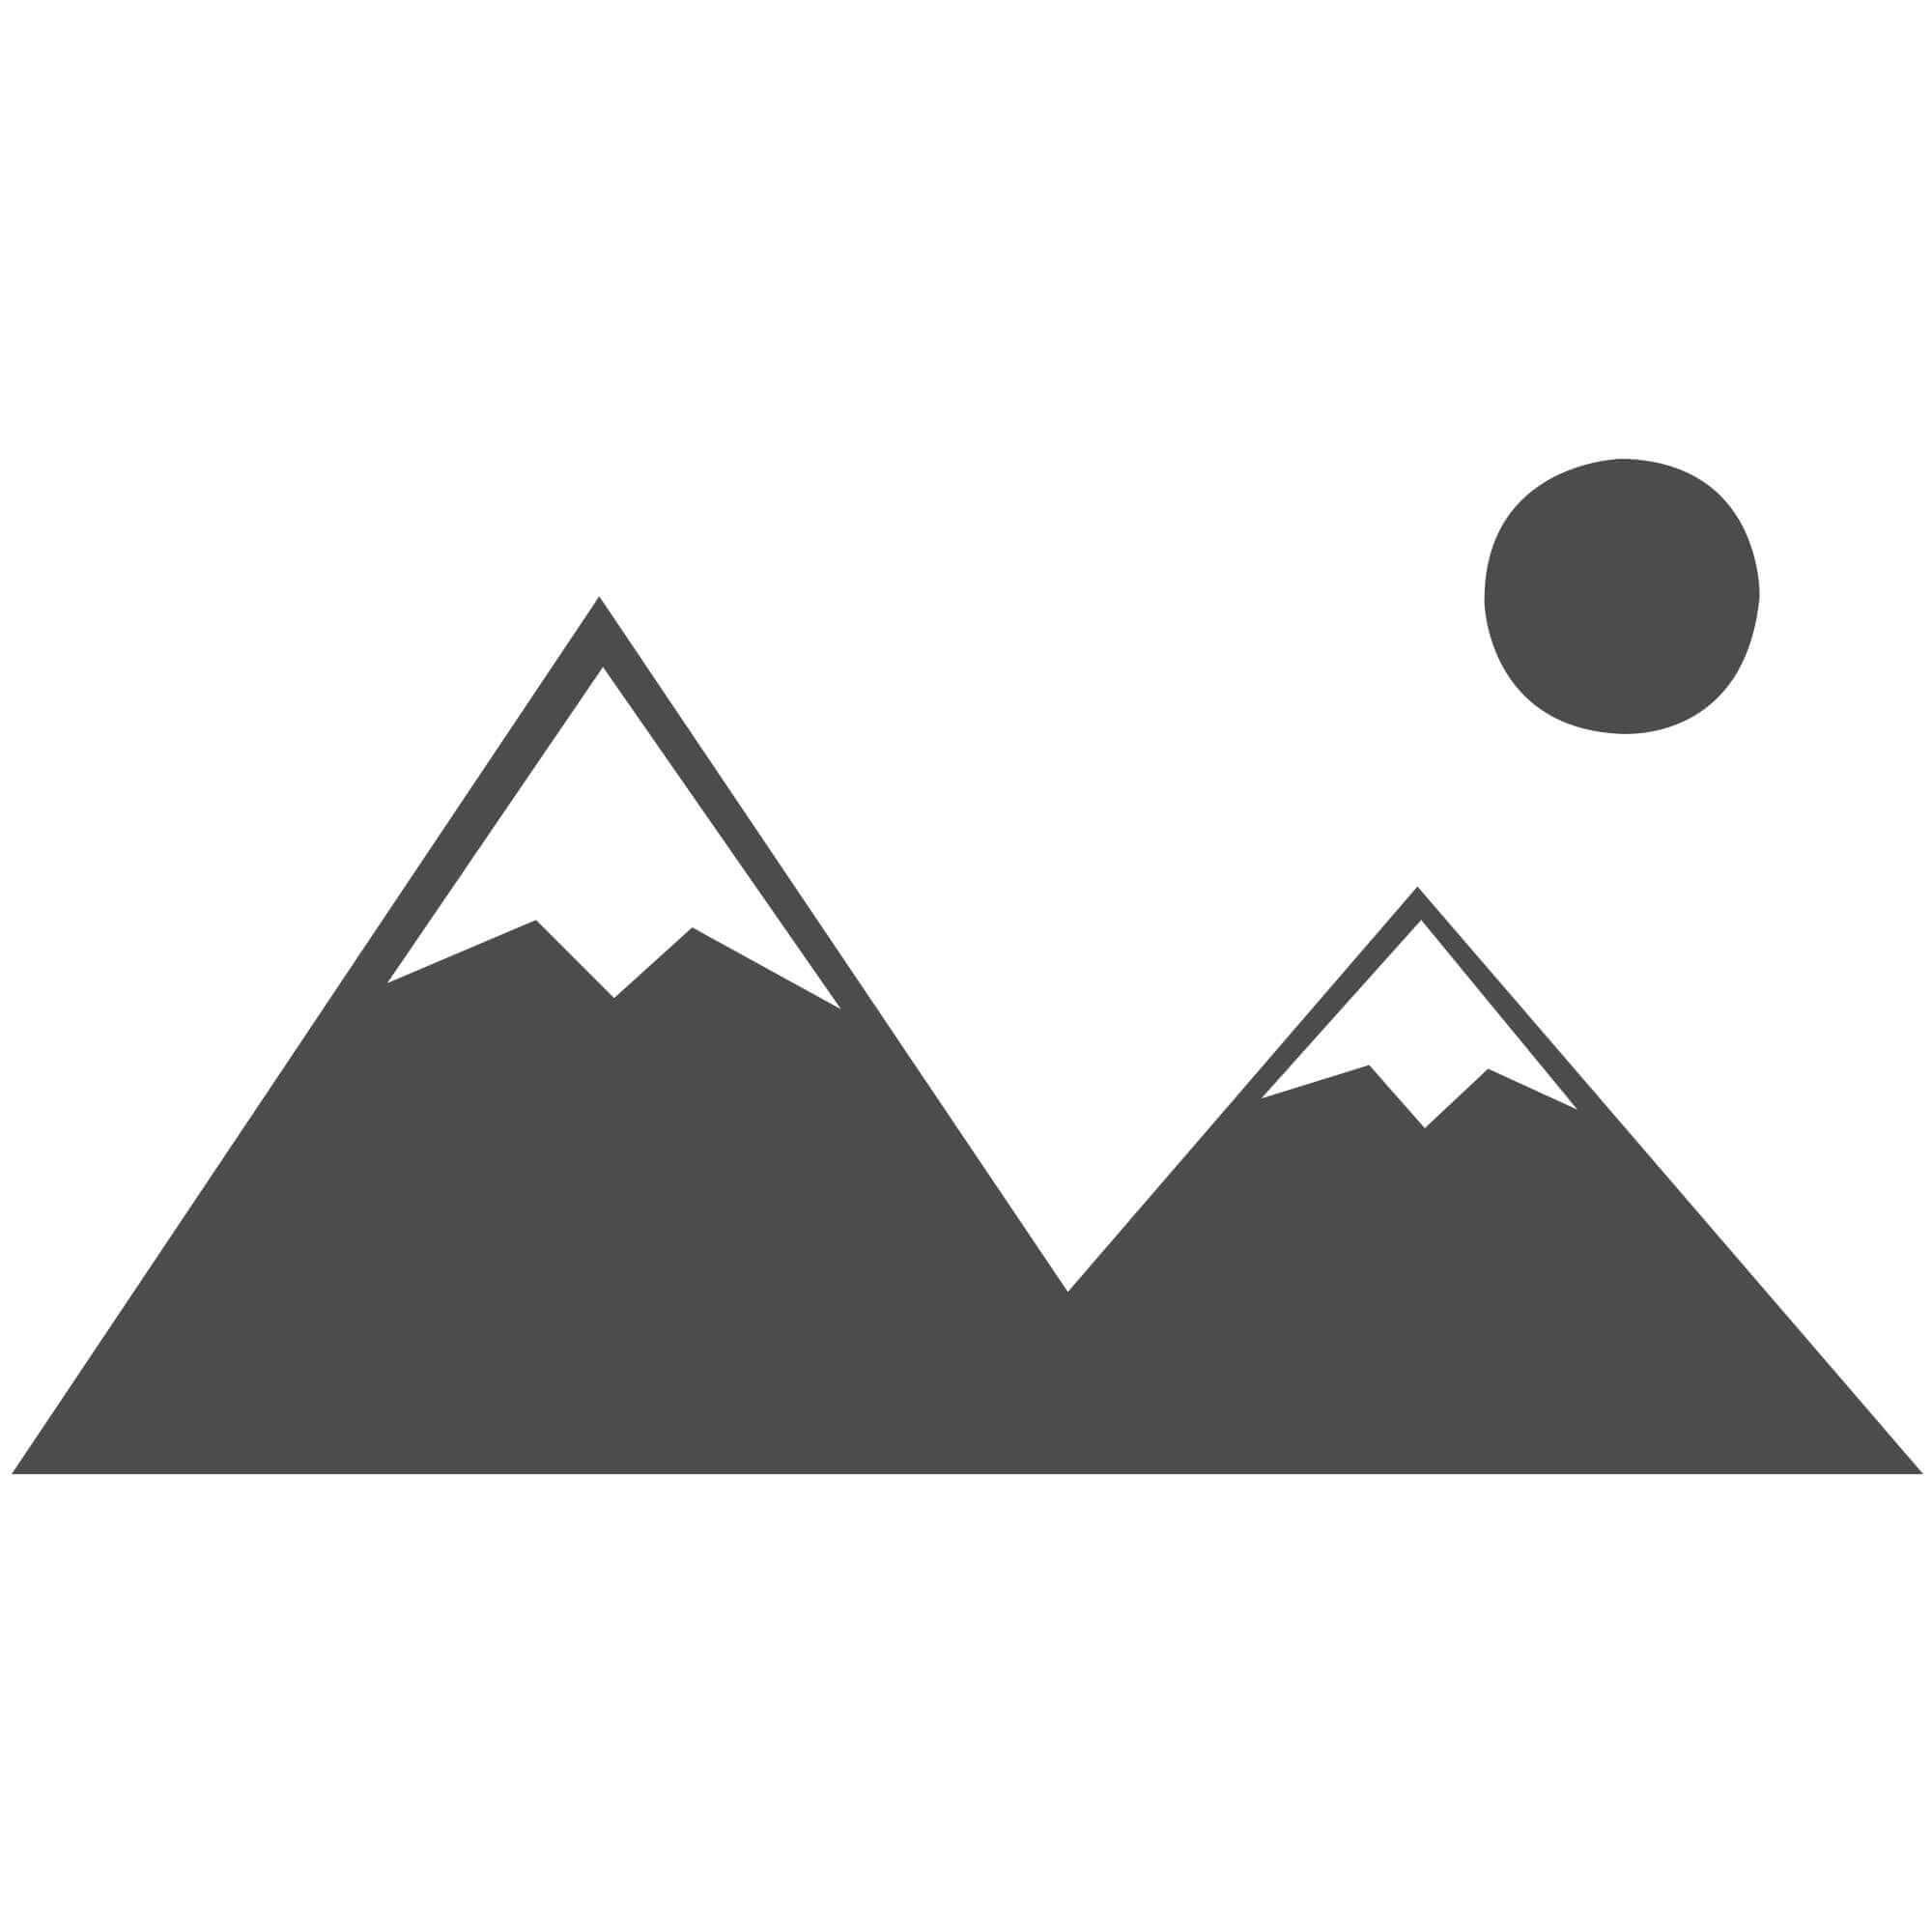 Spectrum Samba Multi Rug - Hall Runner 60 x 220 cm